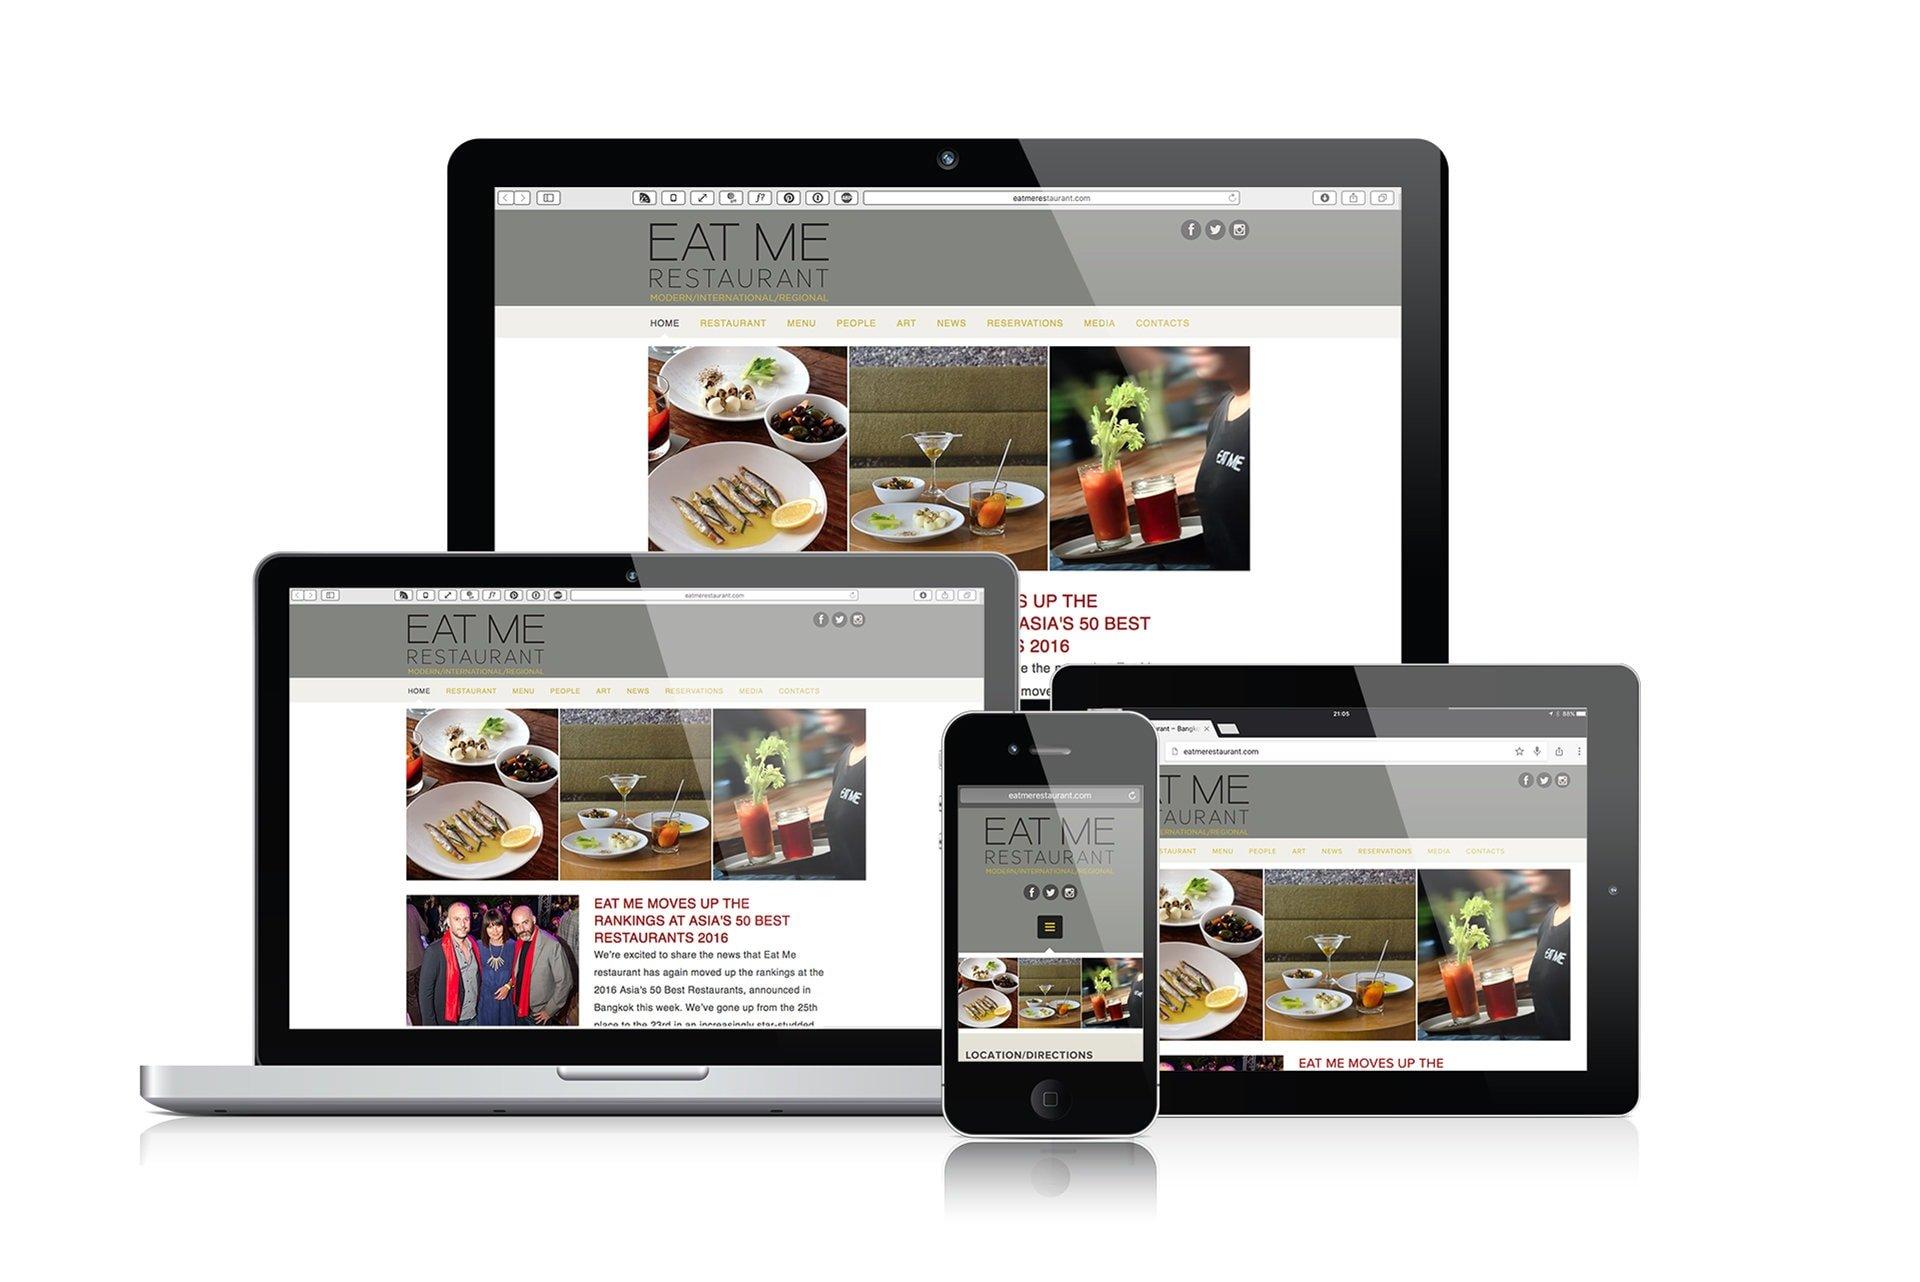 Eat Me Restaurant, Bangkok. Web Design & Development by Grantourismo Media, a Full Service Digital Media Agency.